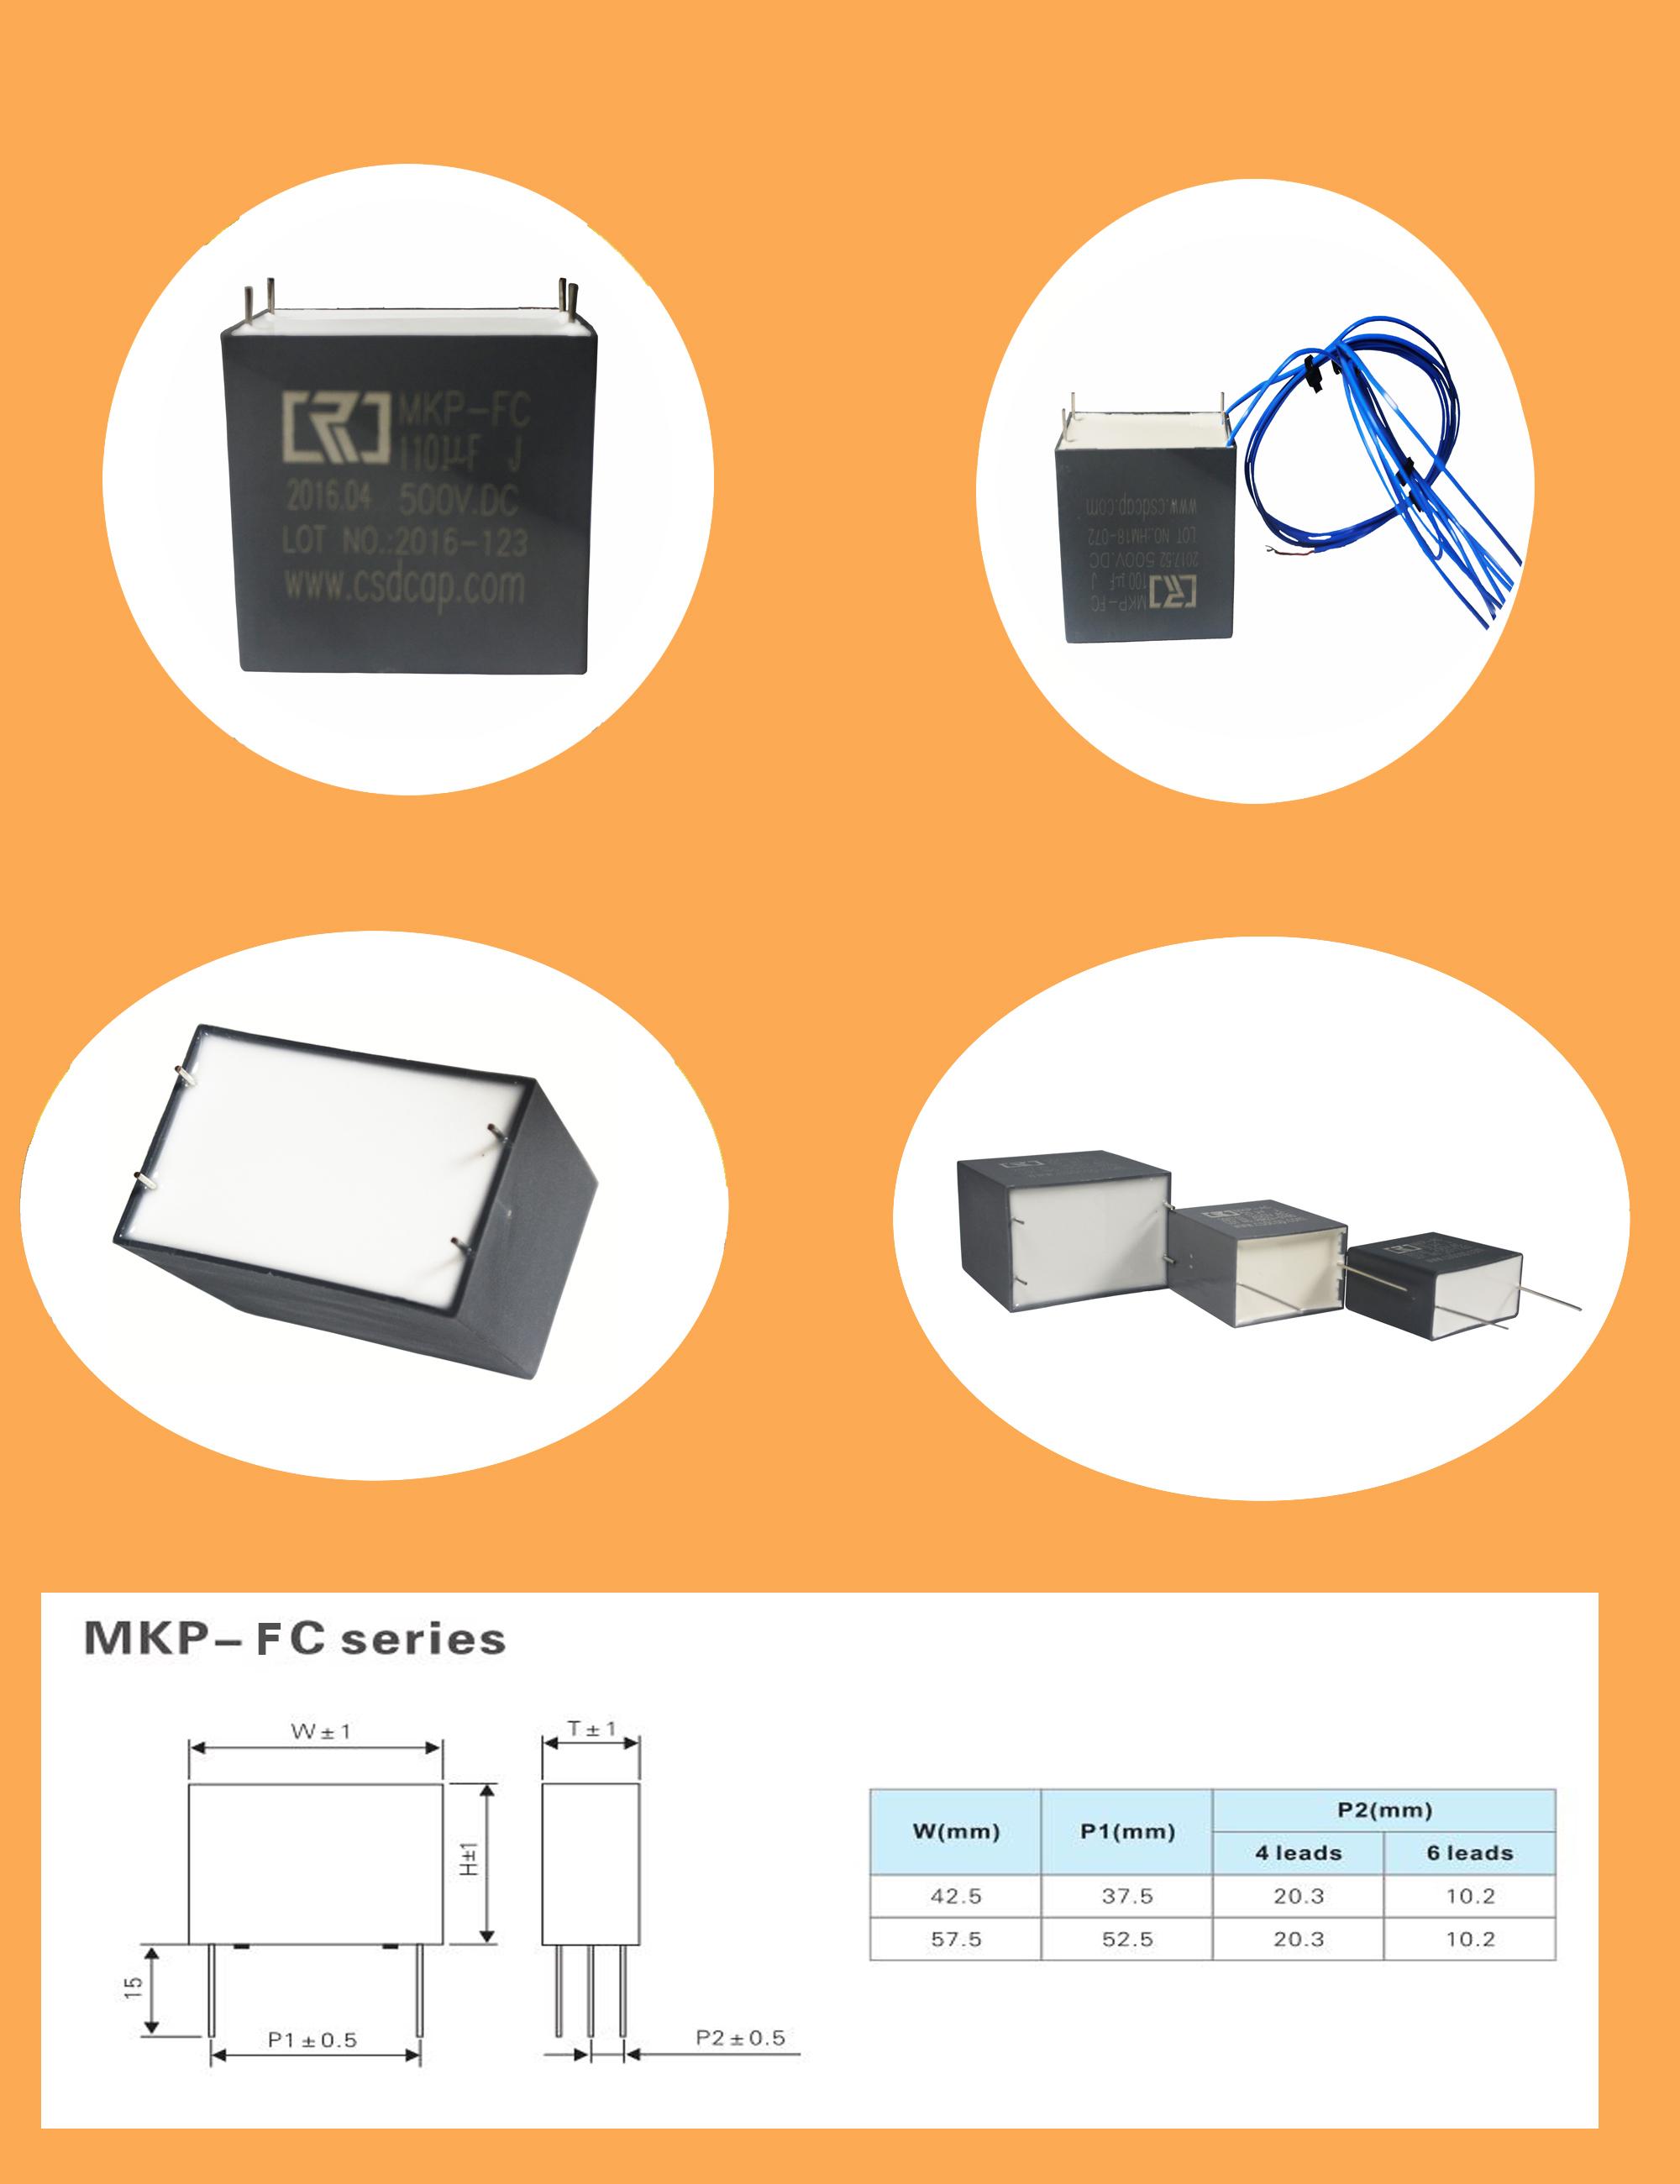 dc link capacitor fc.jpg